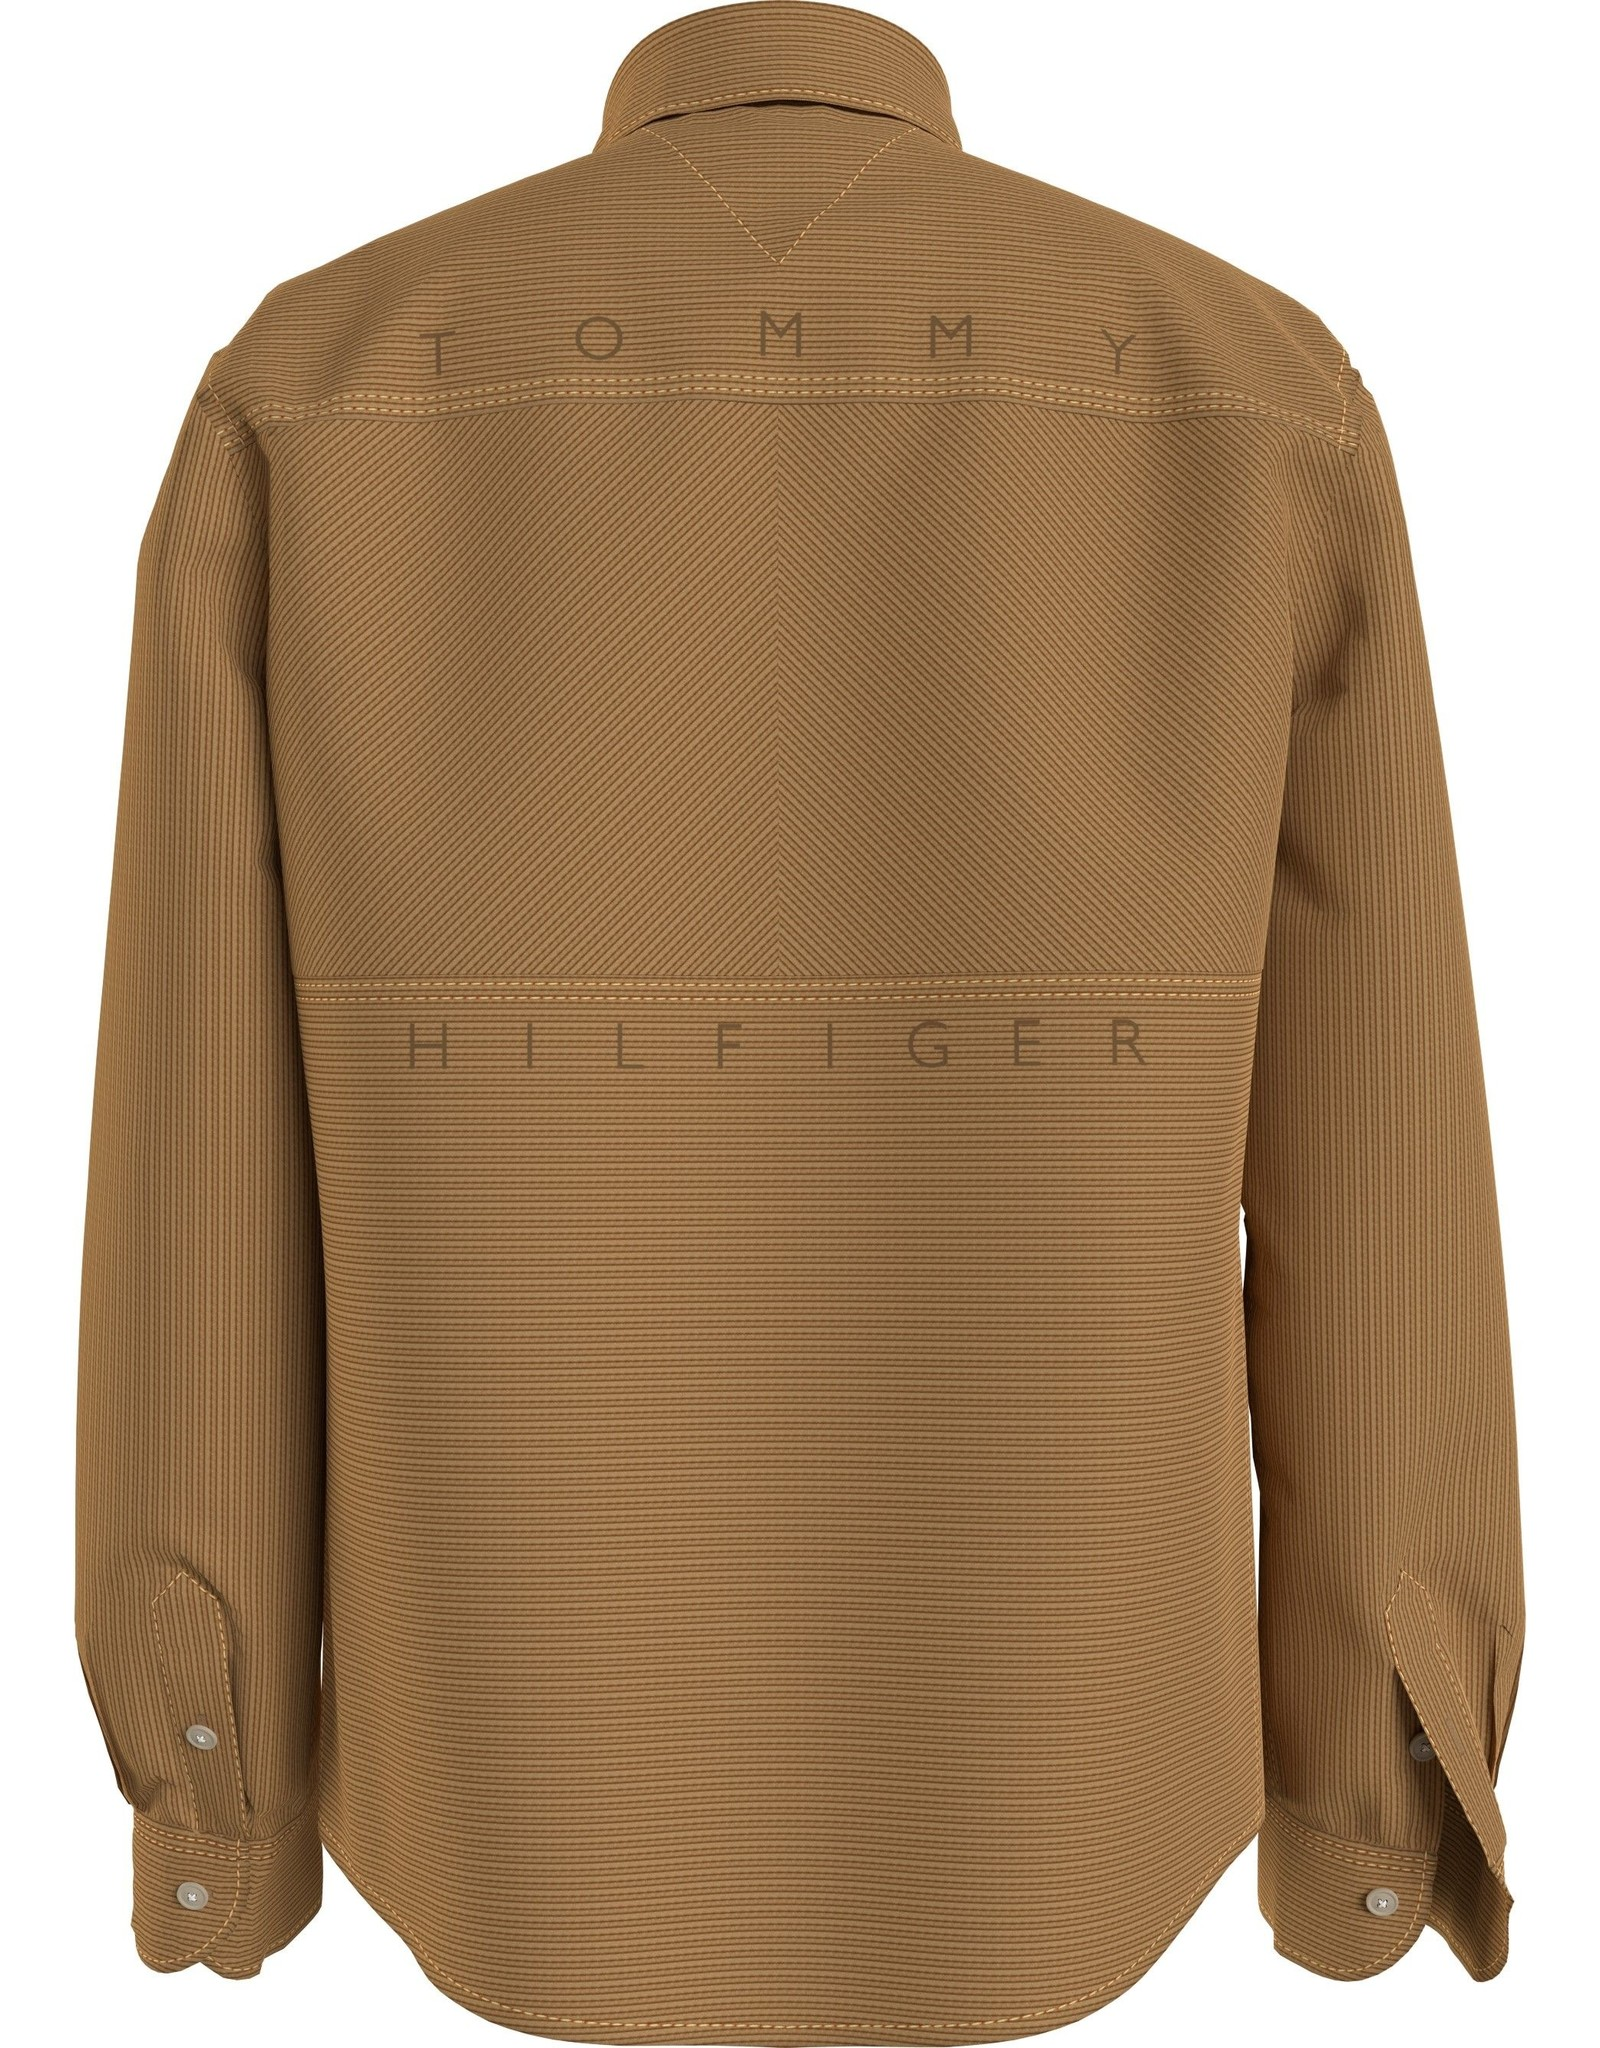 Tommy Hilfiger 6937 Corduroy Blouse